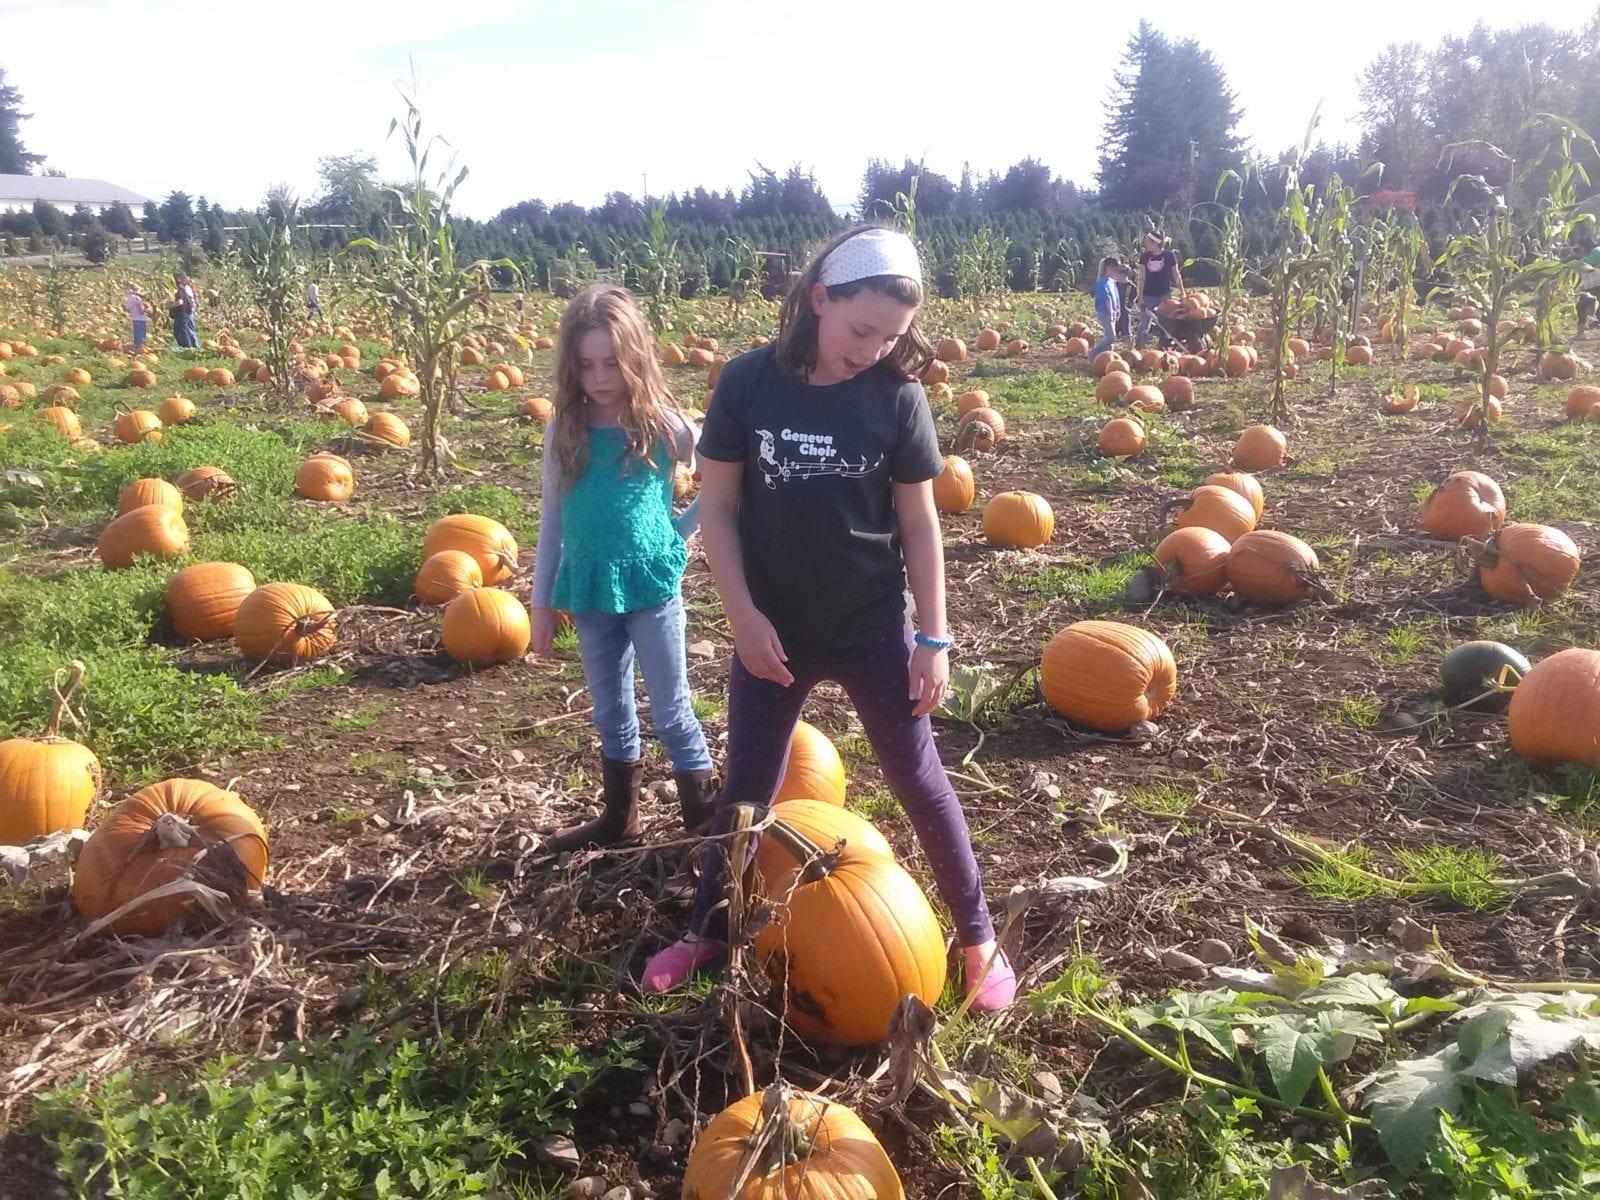 Girls pick out a pumpkin at Stoney Ridge Farm, Everson